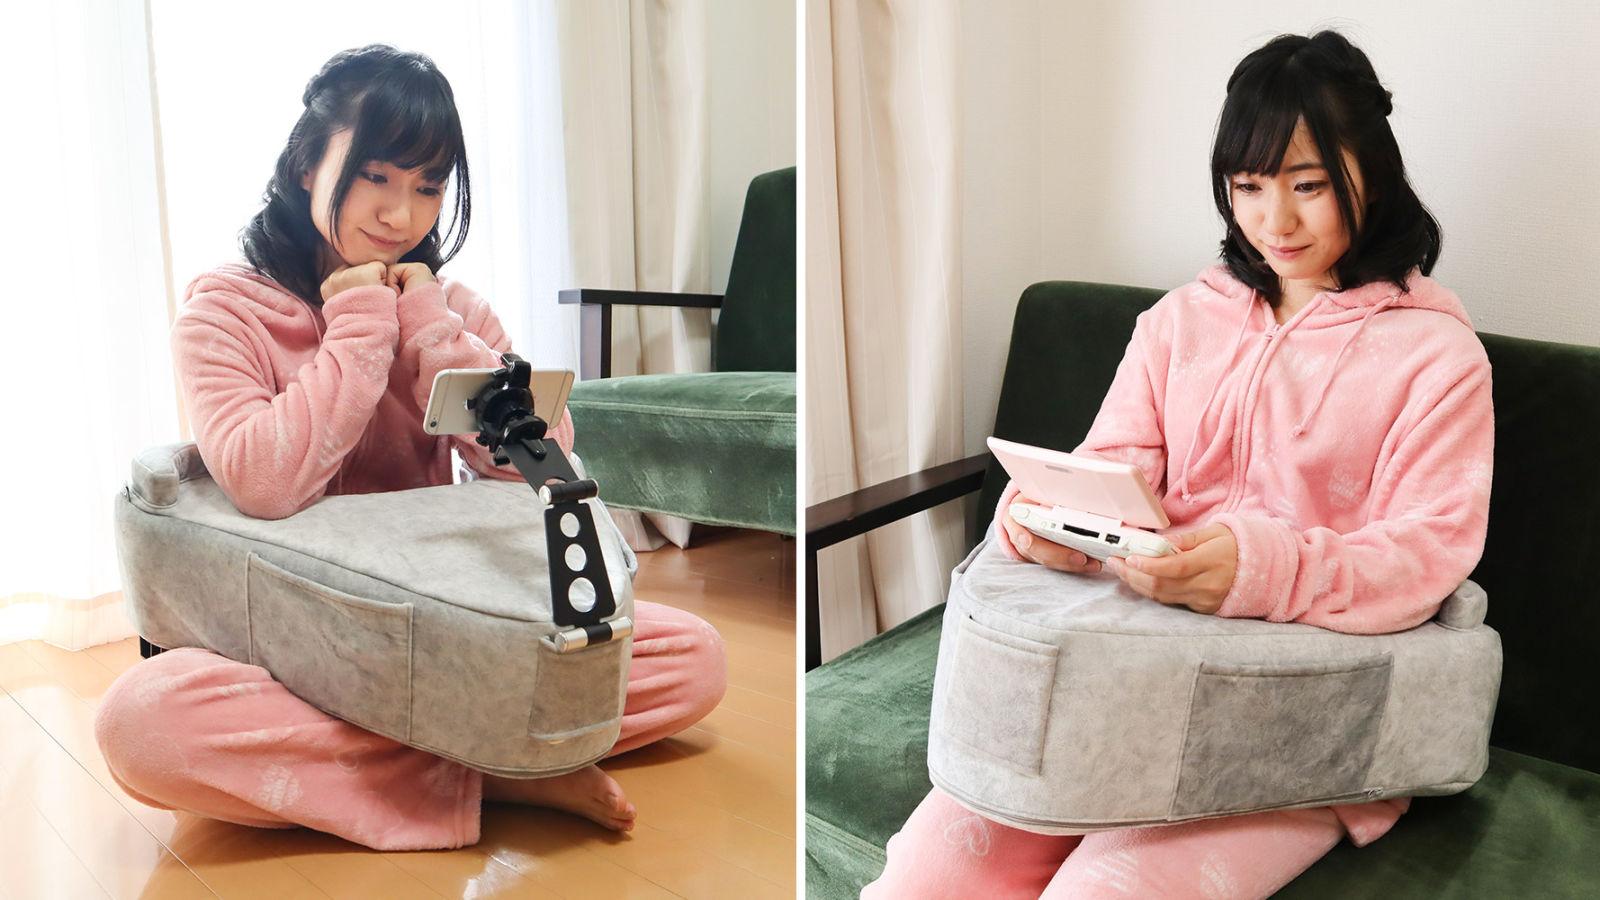 Turn-a-Cushion Gaming